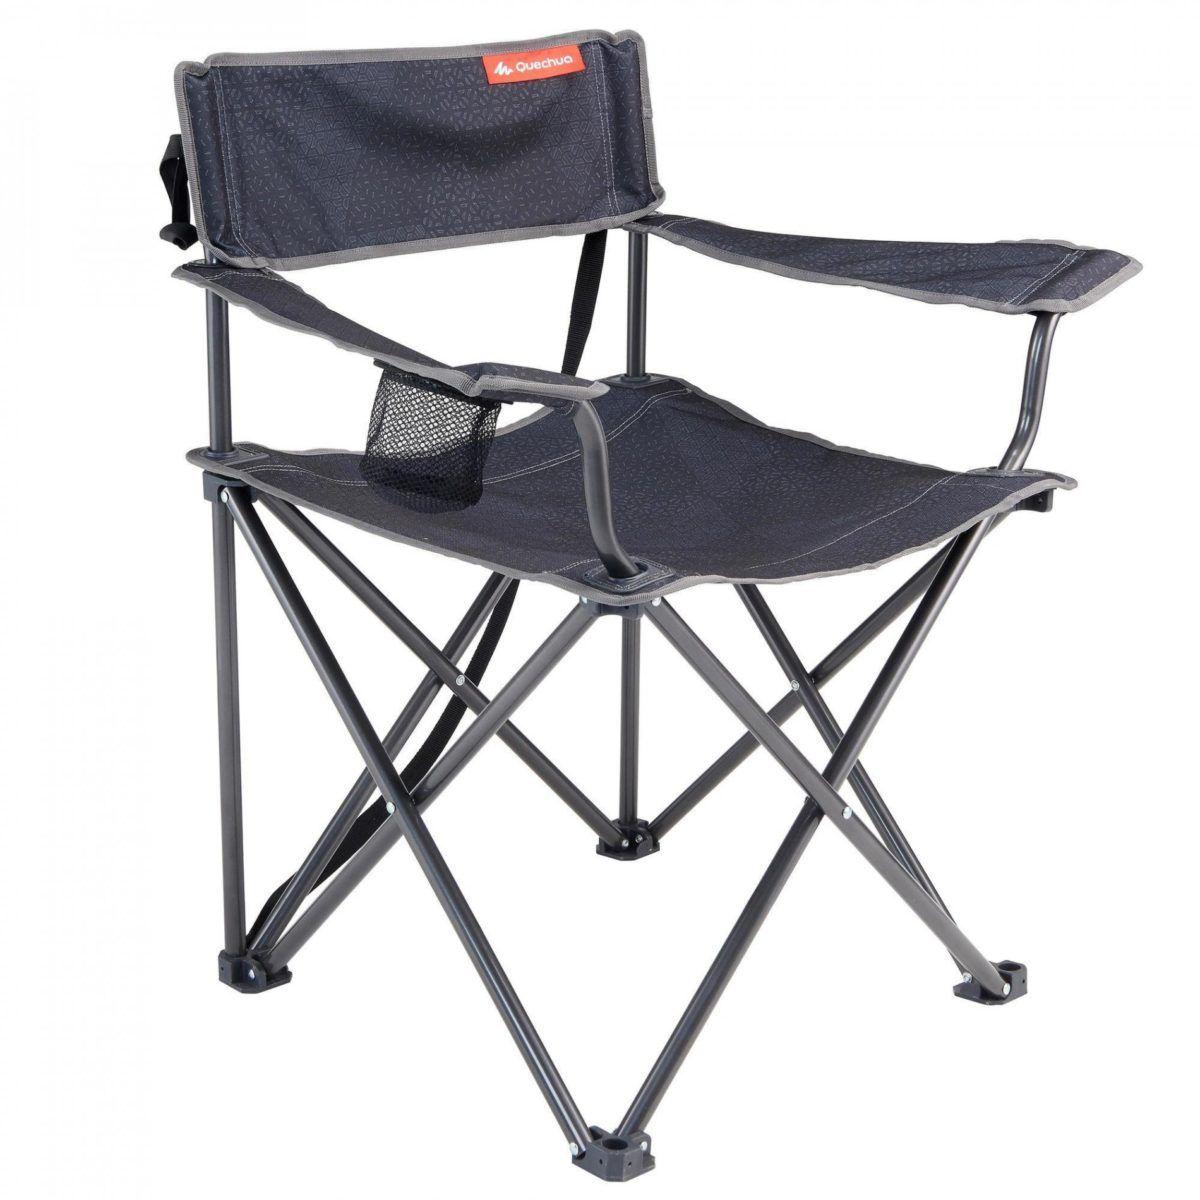 Please Check More Awesome 10 Gigantische Invloeden Van Fauteuil Peche Decathlon Fauteuil Peche Tienkamp Faut In 2020 Outdoor Chairs Butterfly Chair Folding Chair